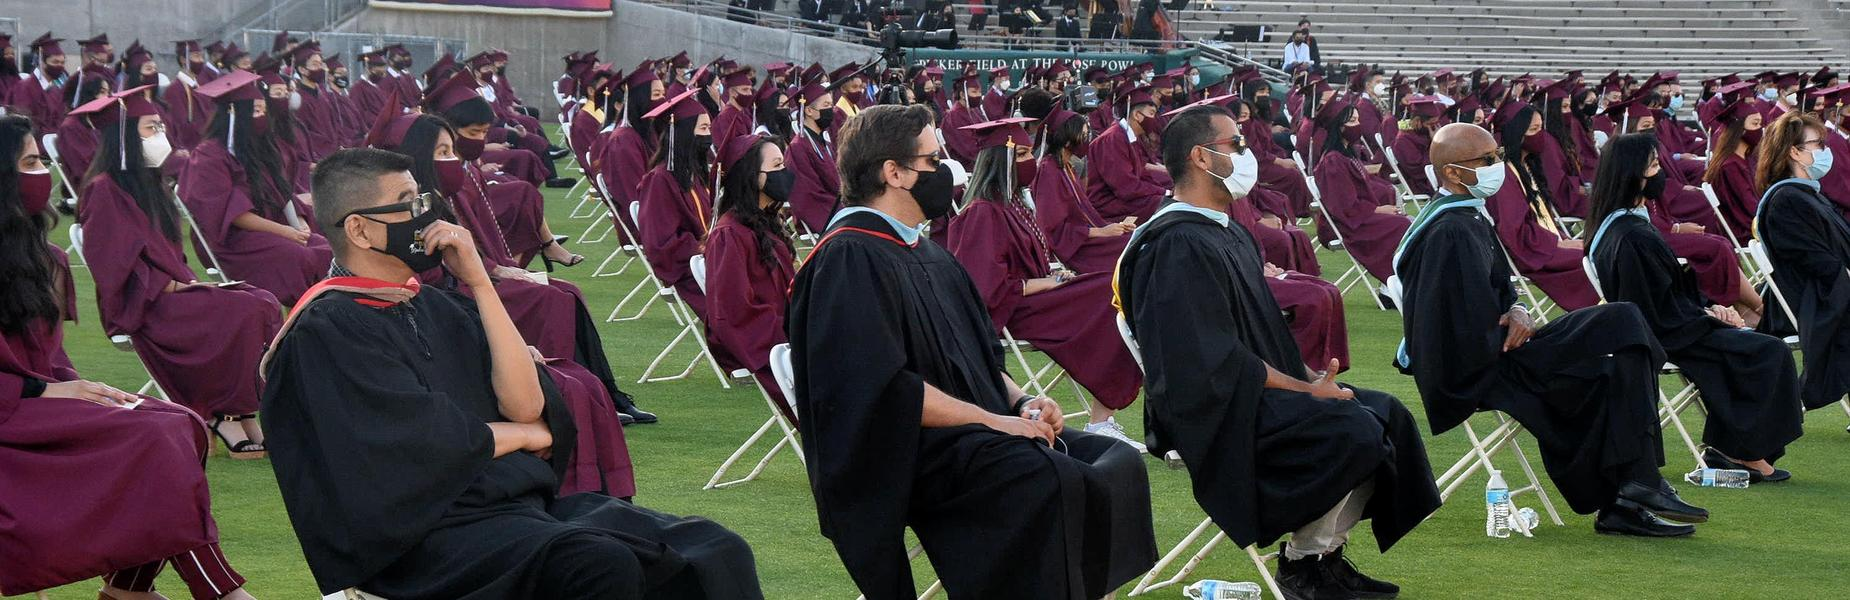 2021 MKHS Graduation held at the Rose Bowl